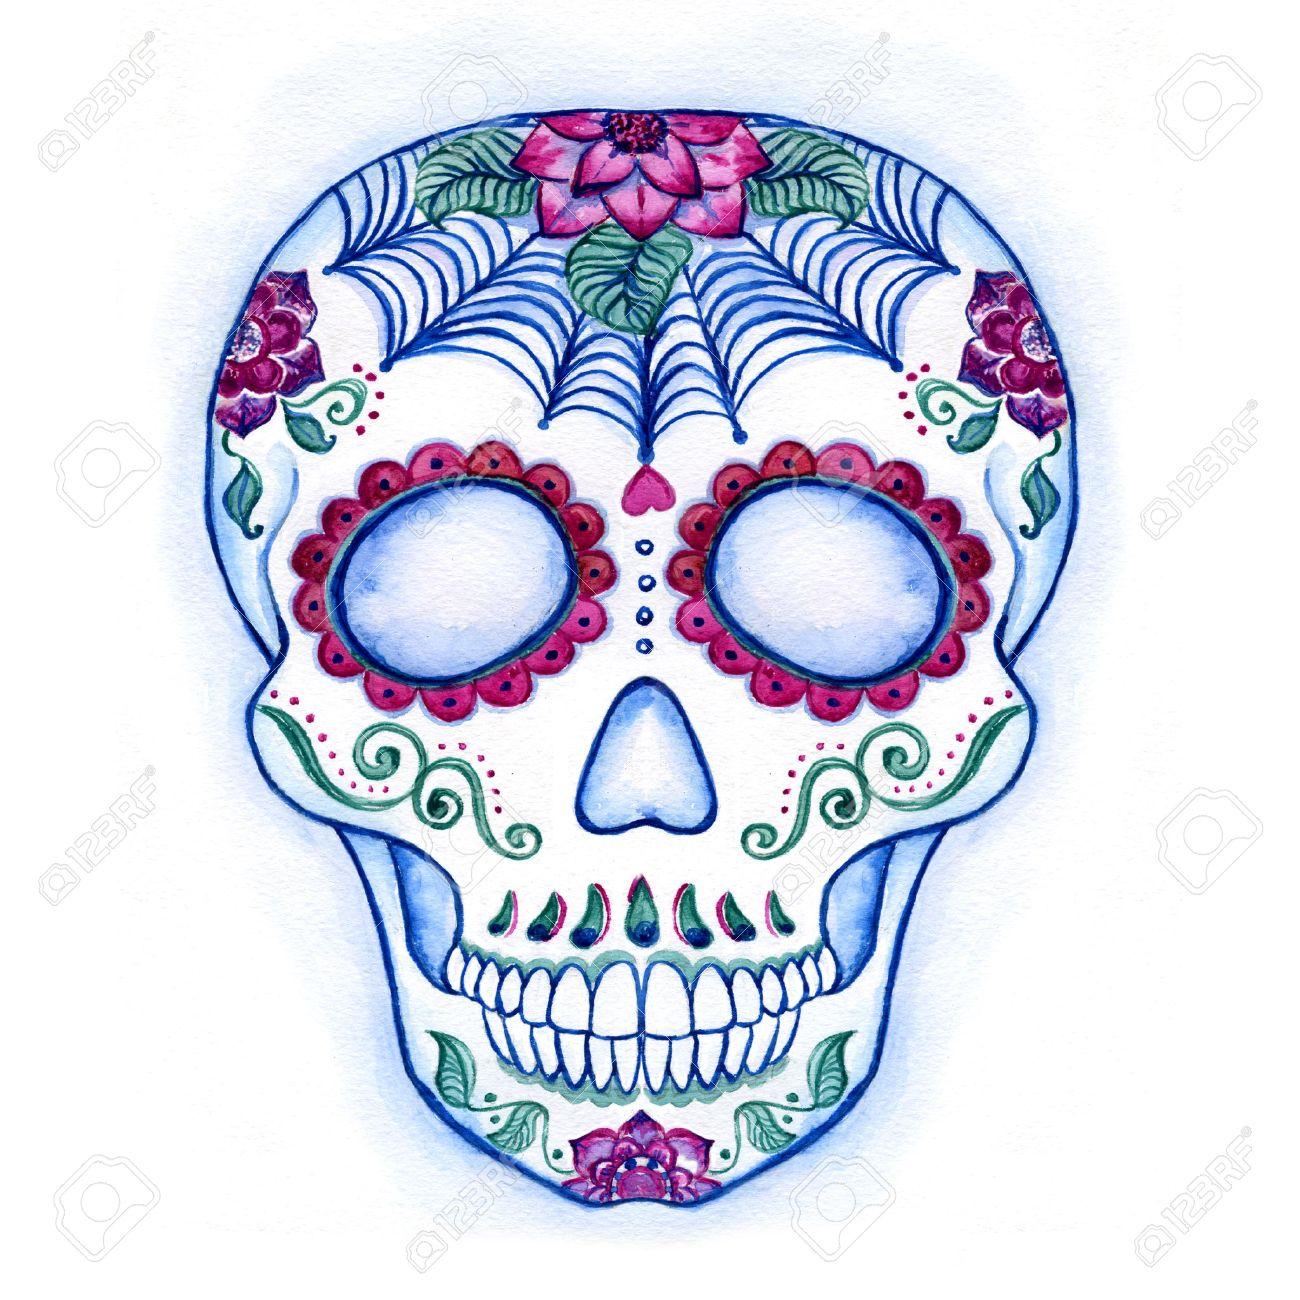 sugar skull drawing template at getdrawings com free for personal